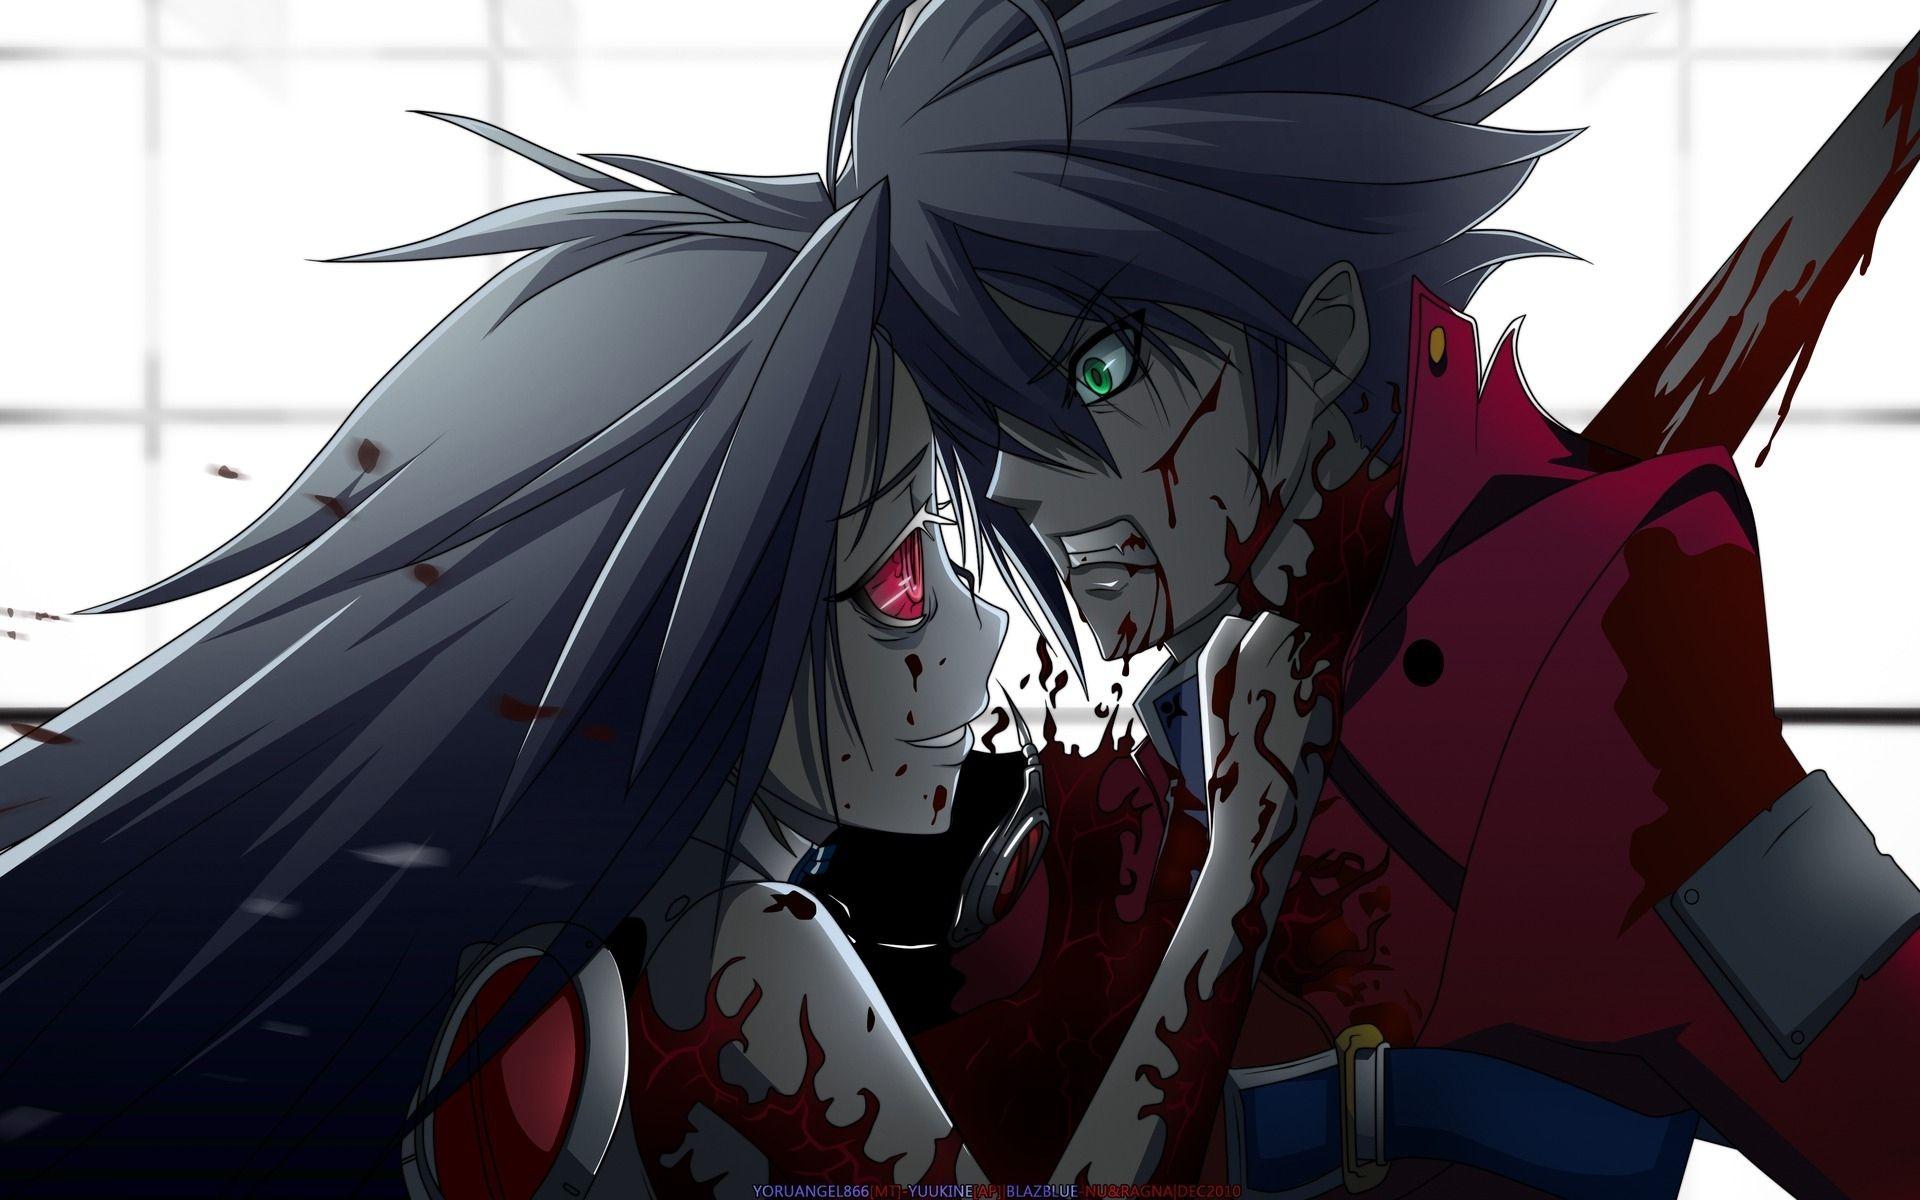 Unduh 95+ Violent Anime Wallpaper Hd HD Terbaru